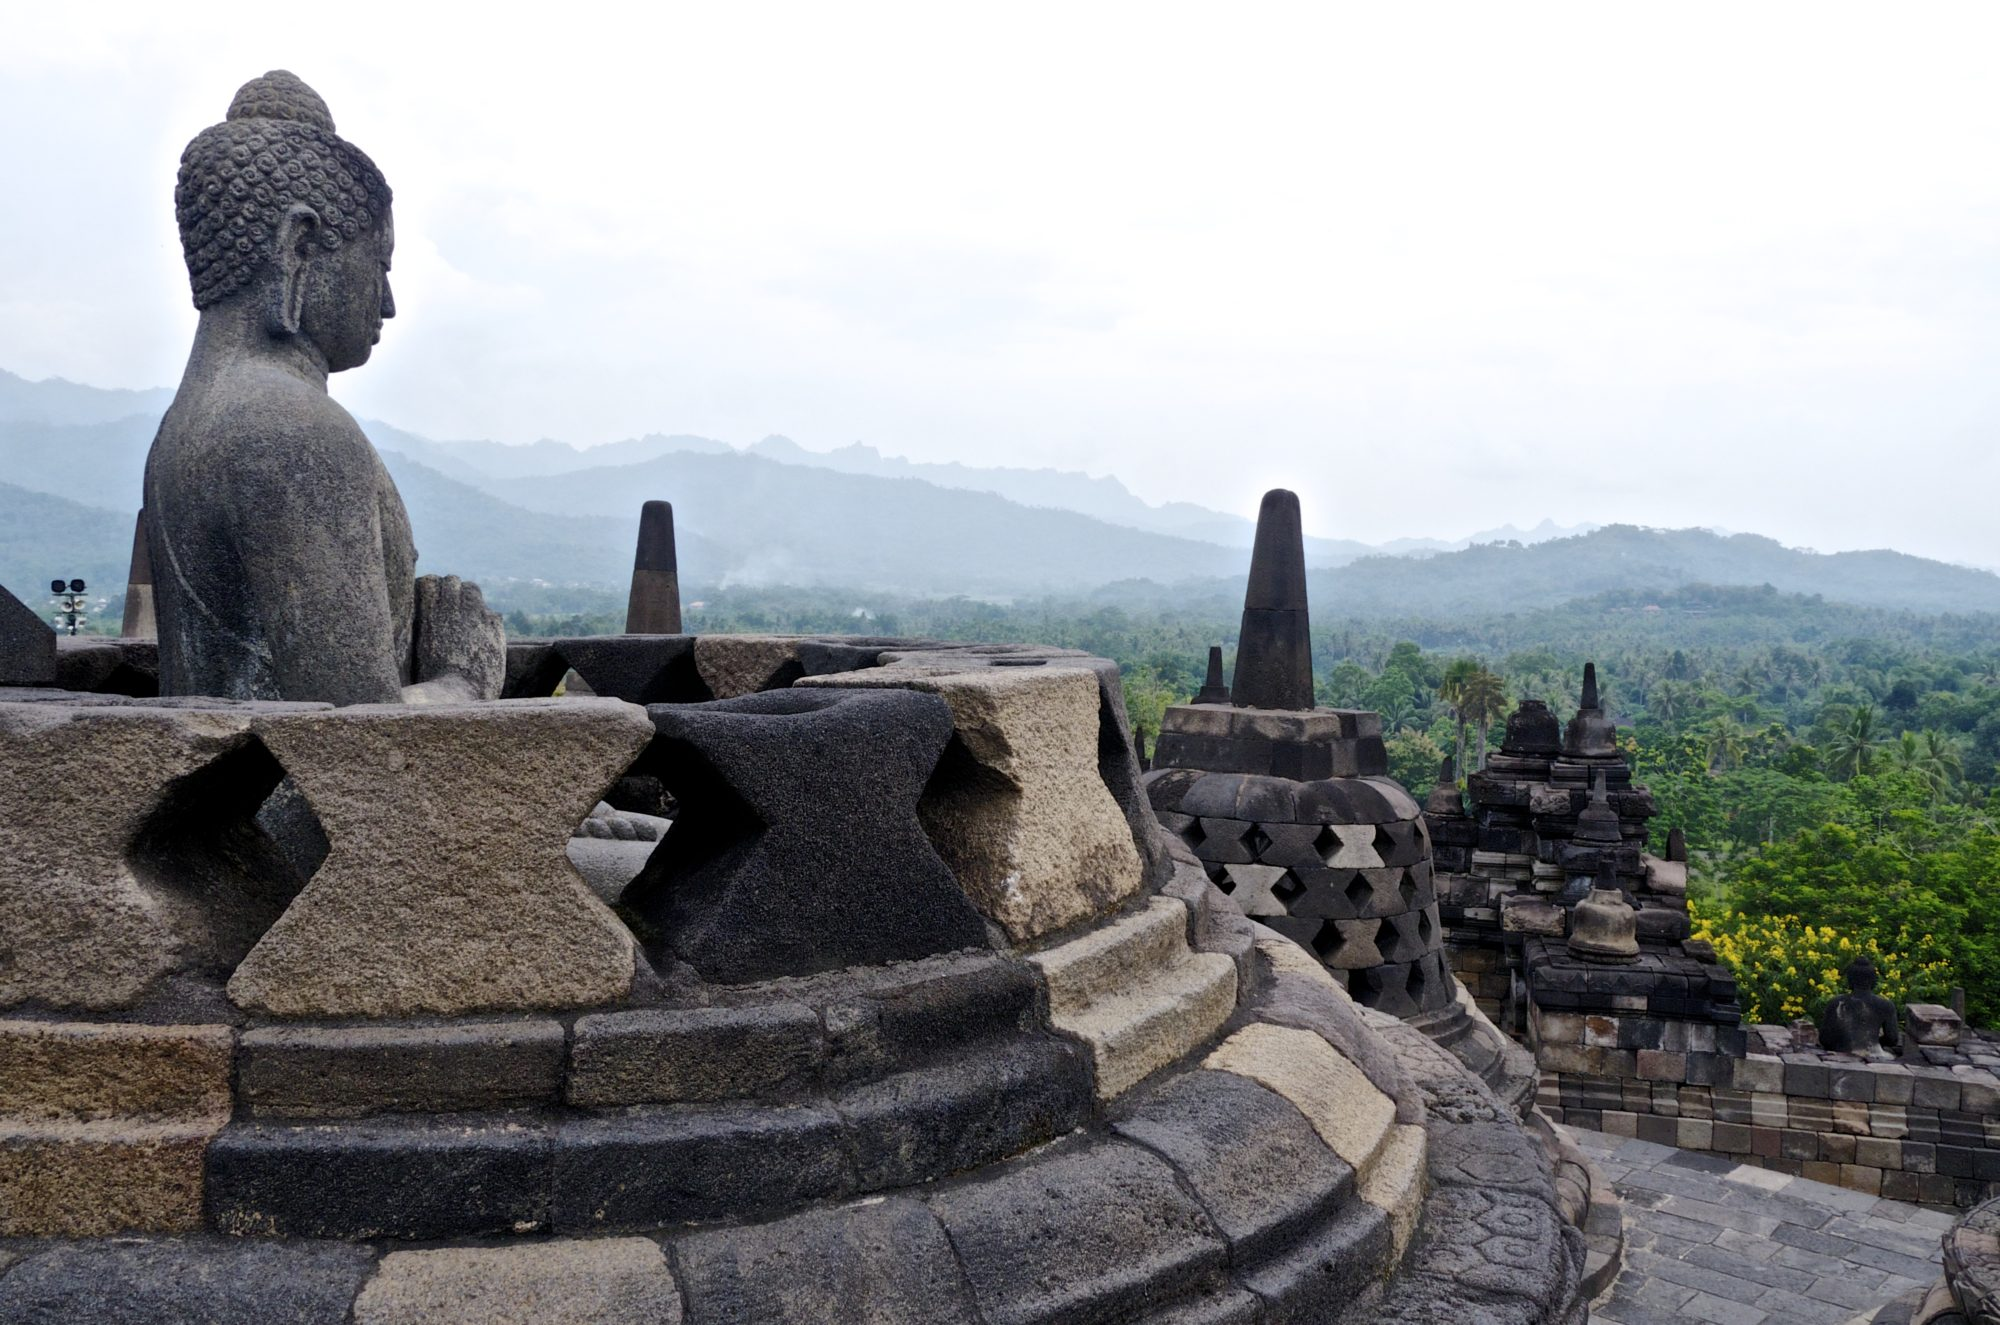 Visiting Borobudur and Prambanan